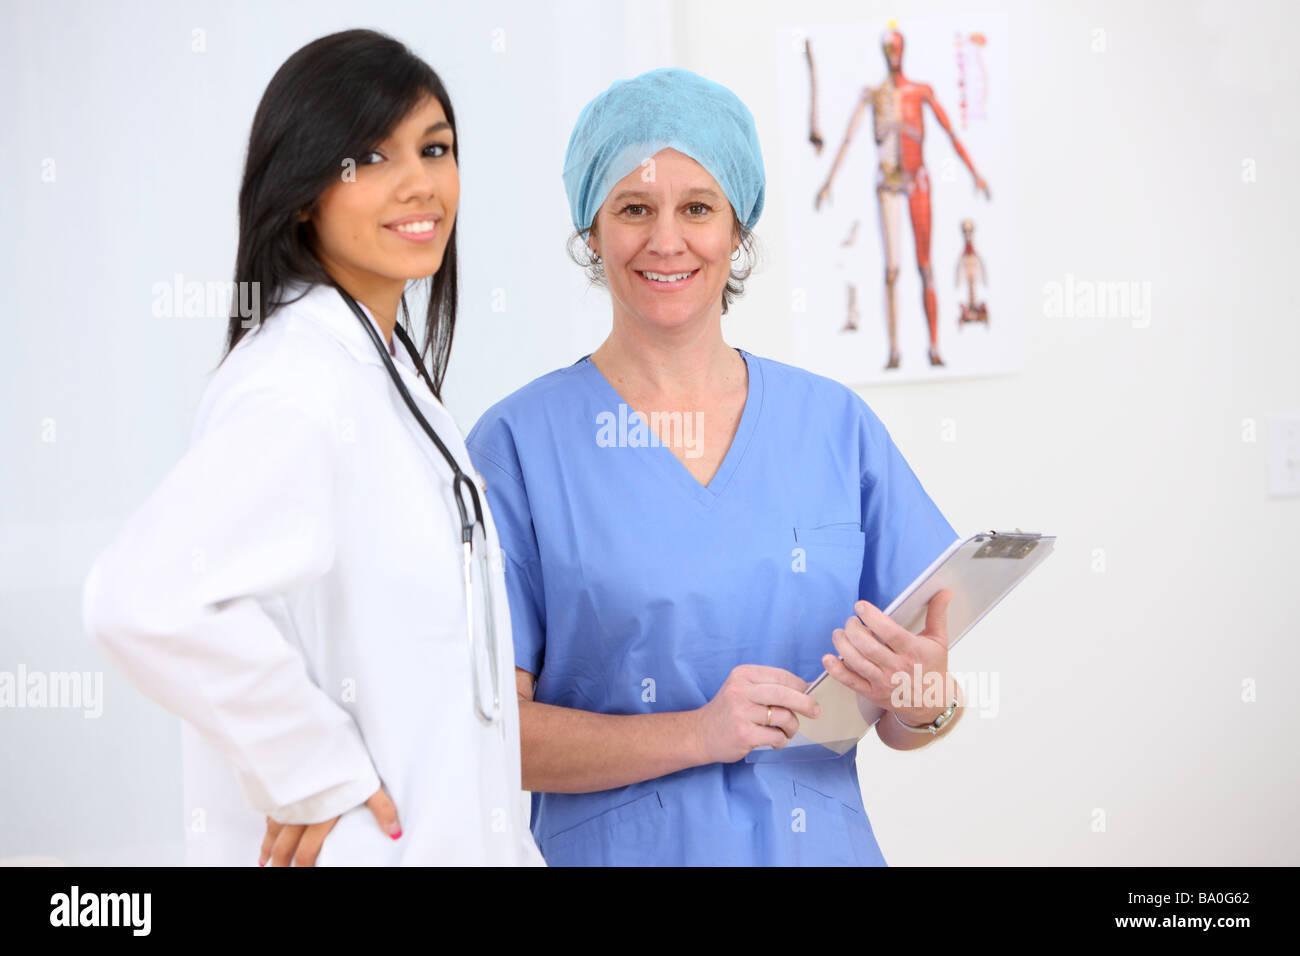 Medizinisches Personal Porträt Stockbild